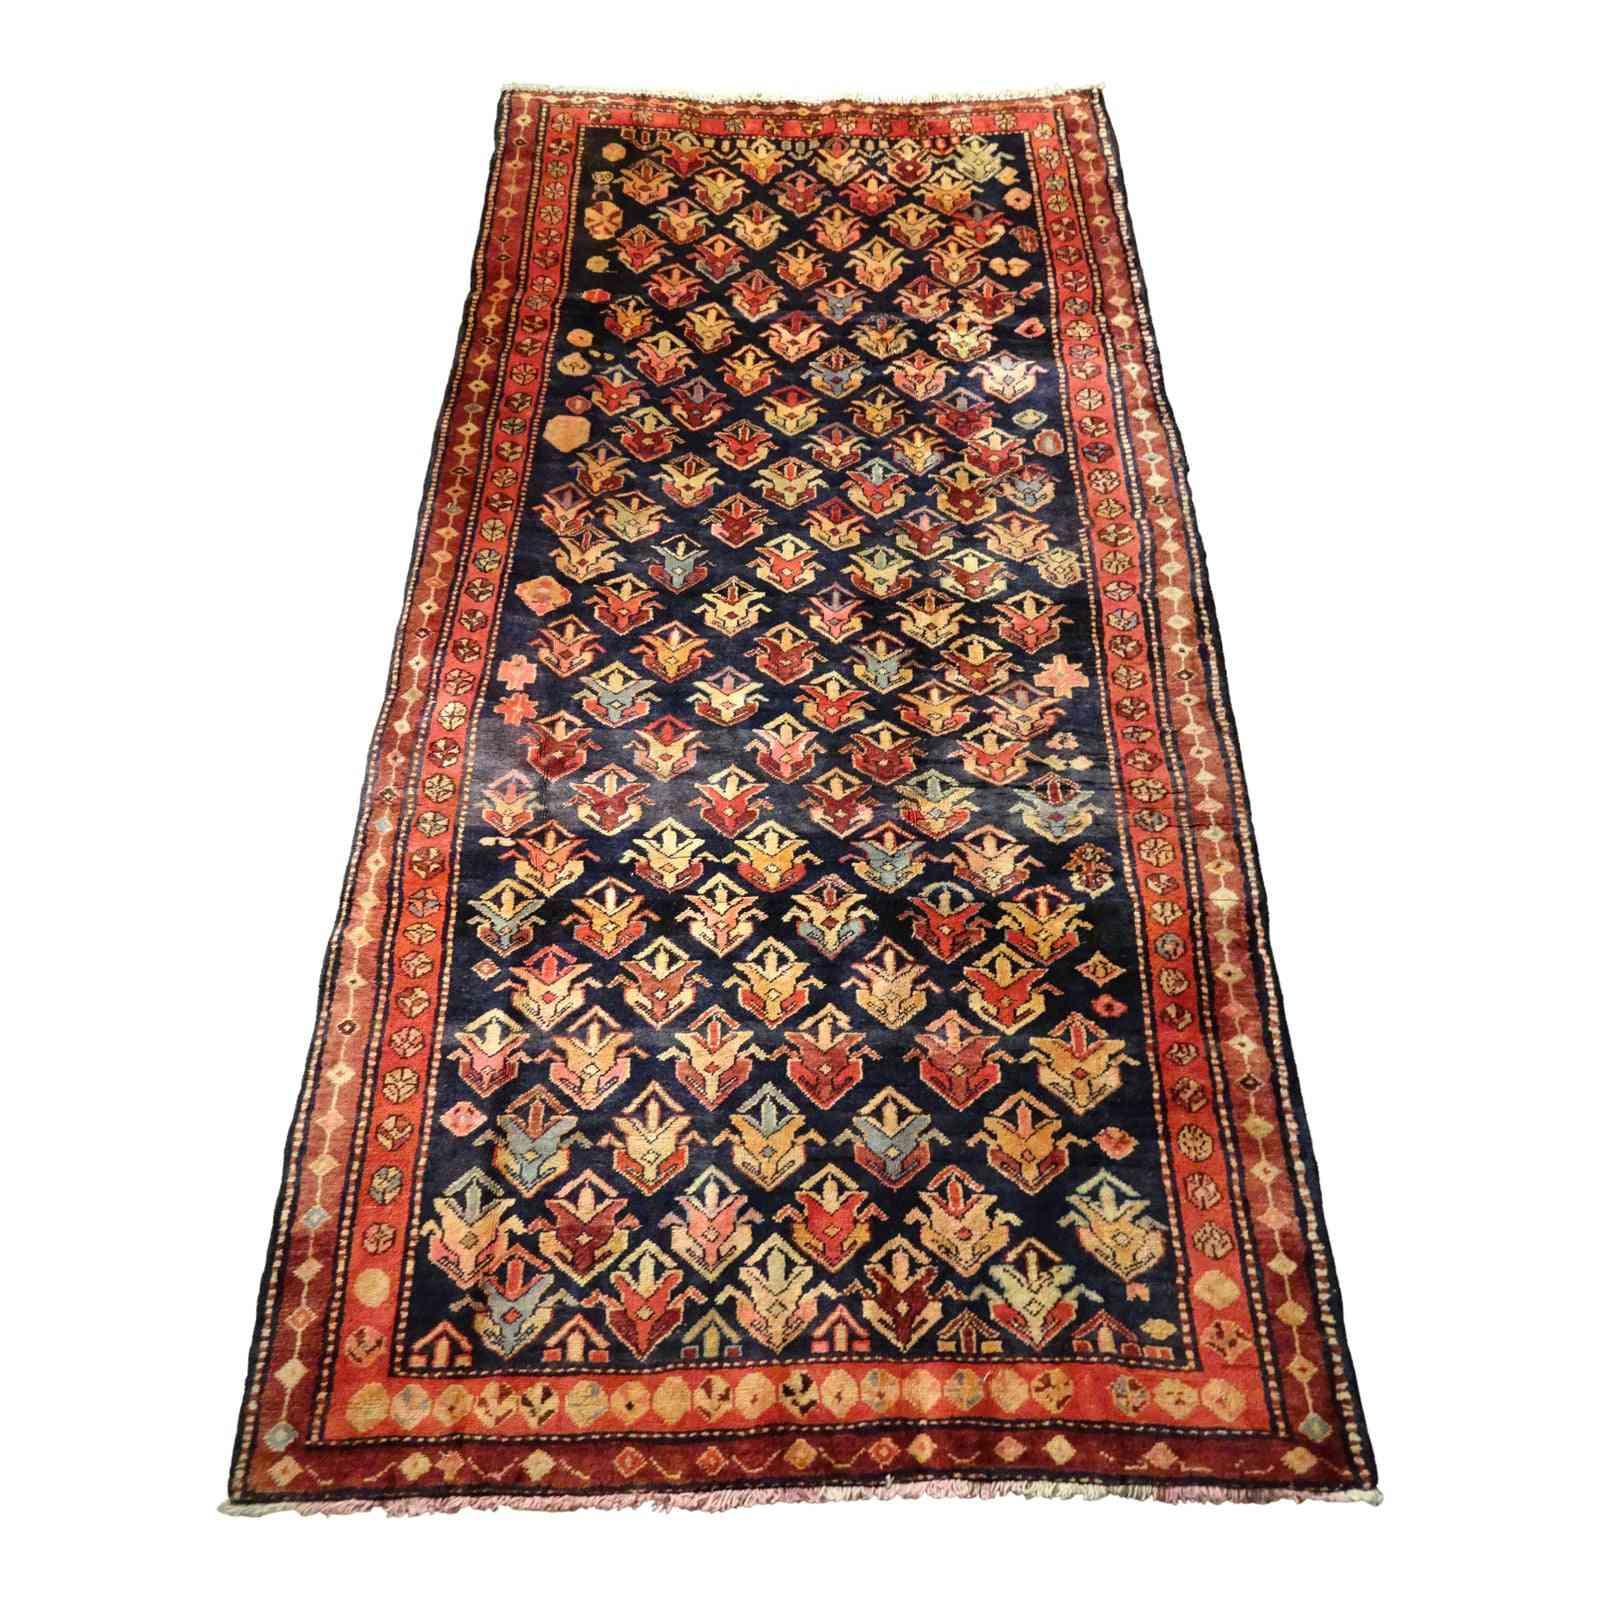 1950s Vintage Seychour Persian Rug